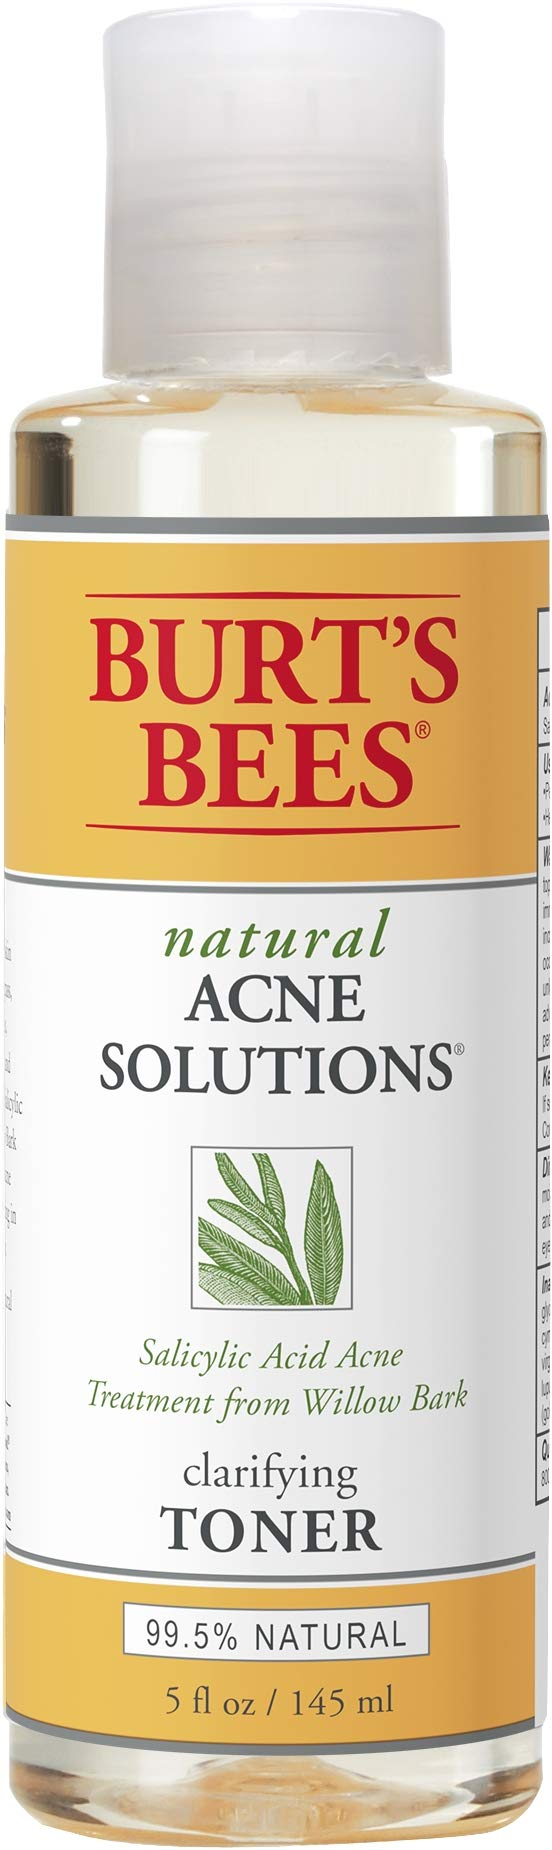 Burts Bees Natural Solutions Clarifying